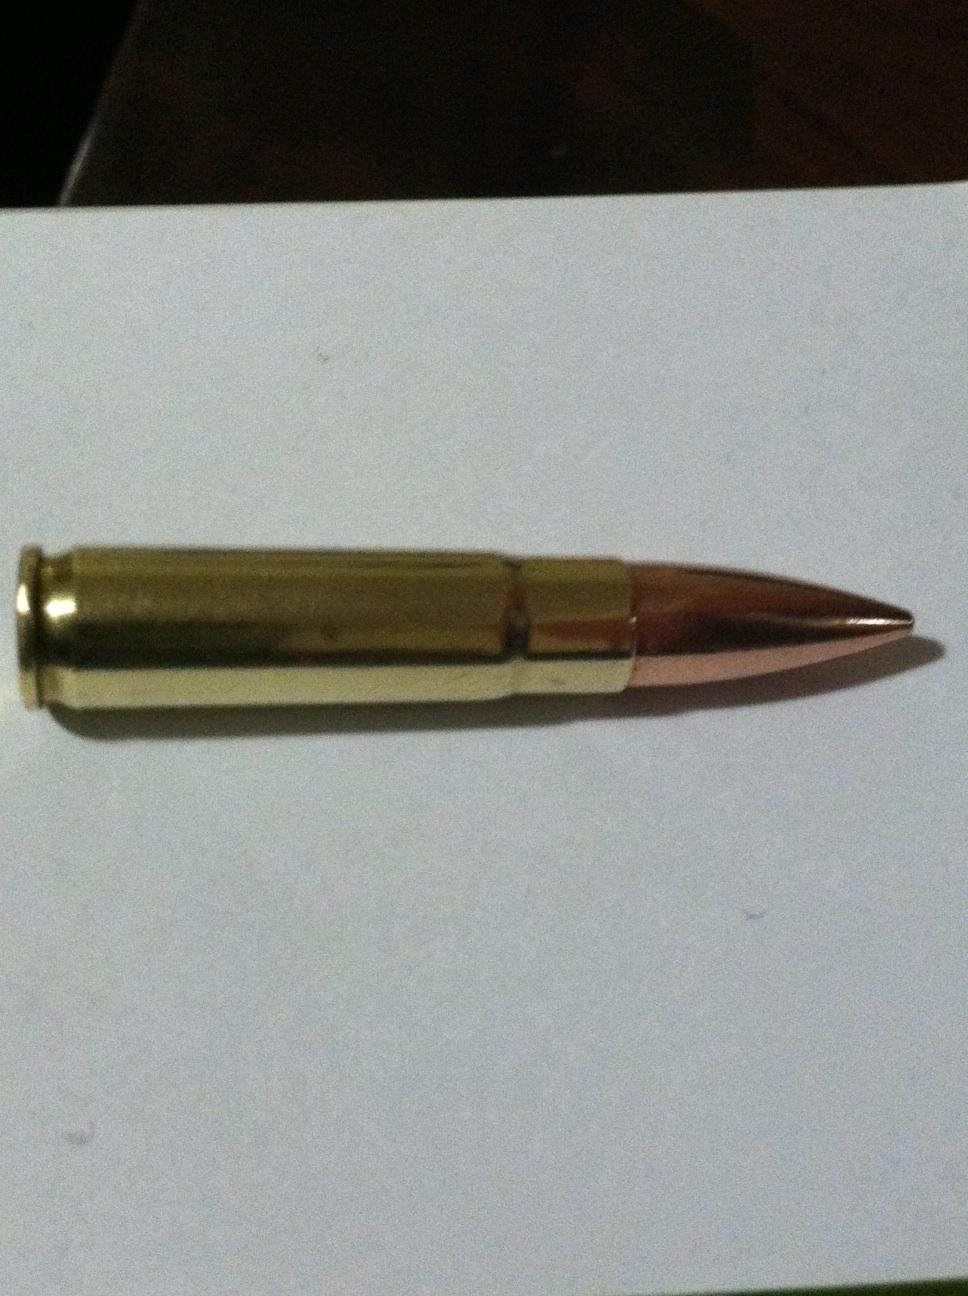 AK47 vs AR15-300-blackout-bullet.jpg